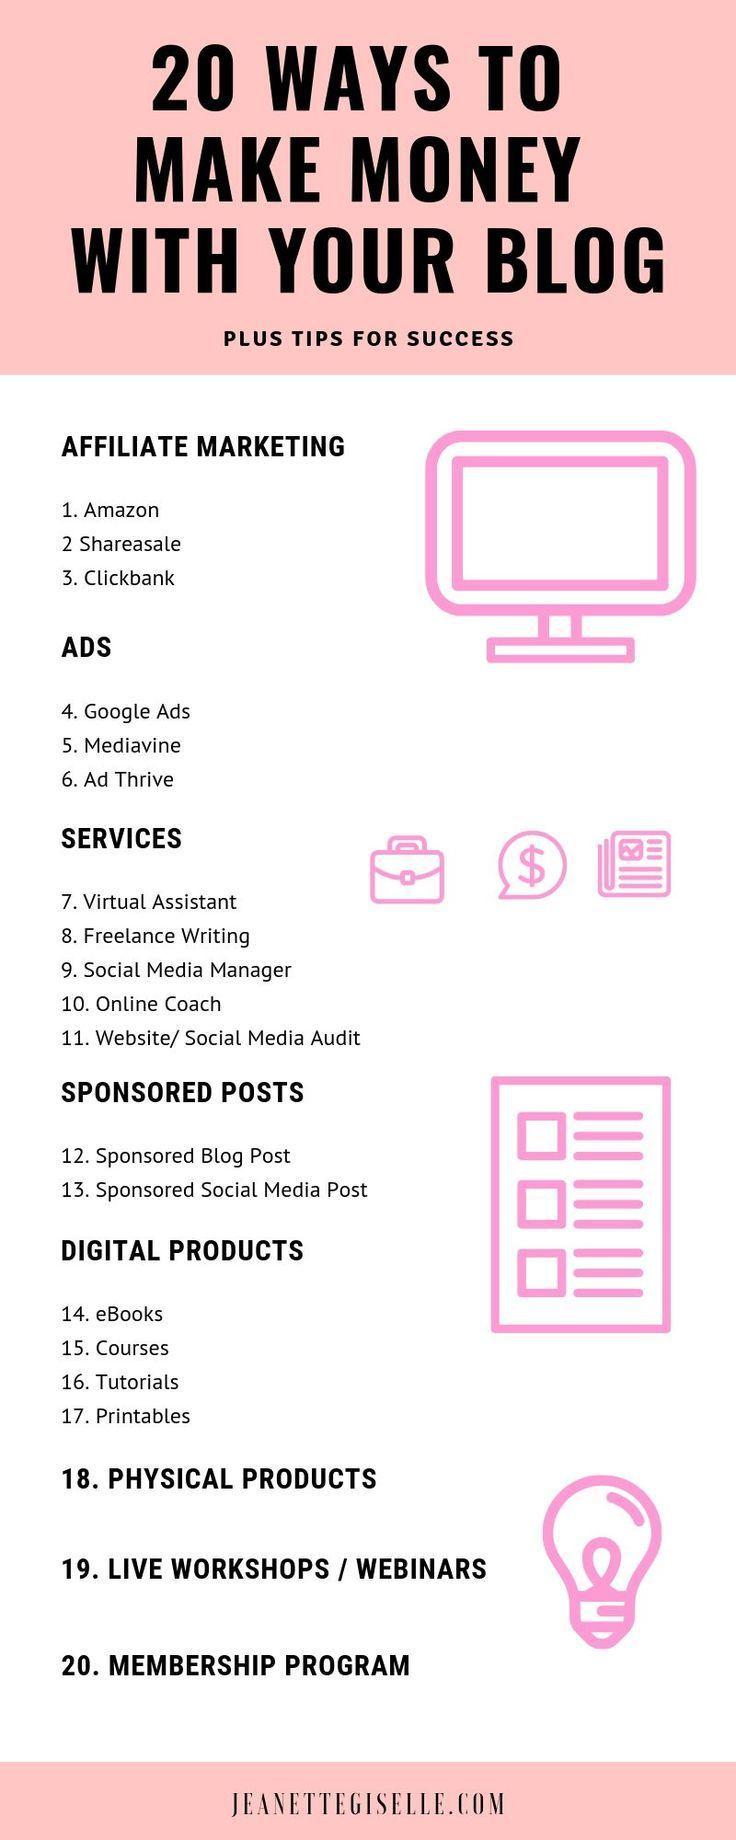 20 ways to Make Money with your Blog #crochetformoney